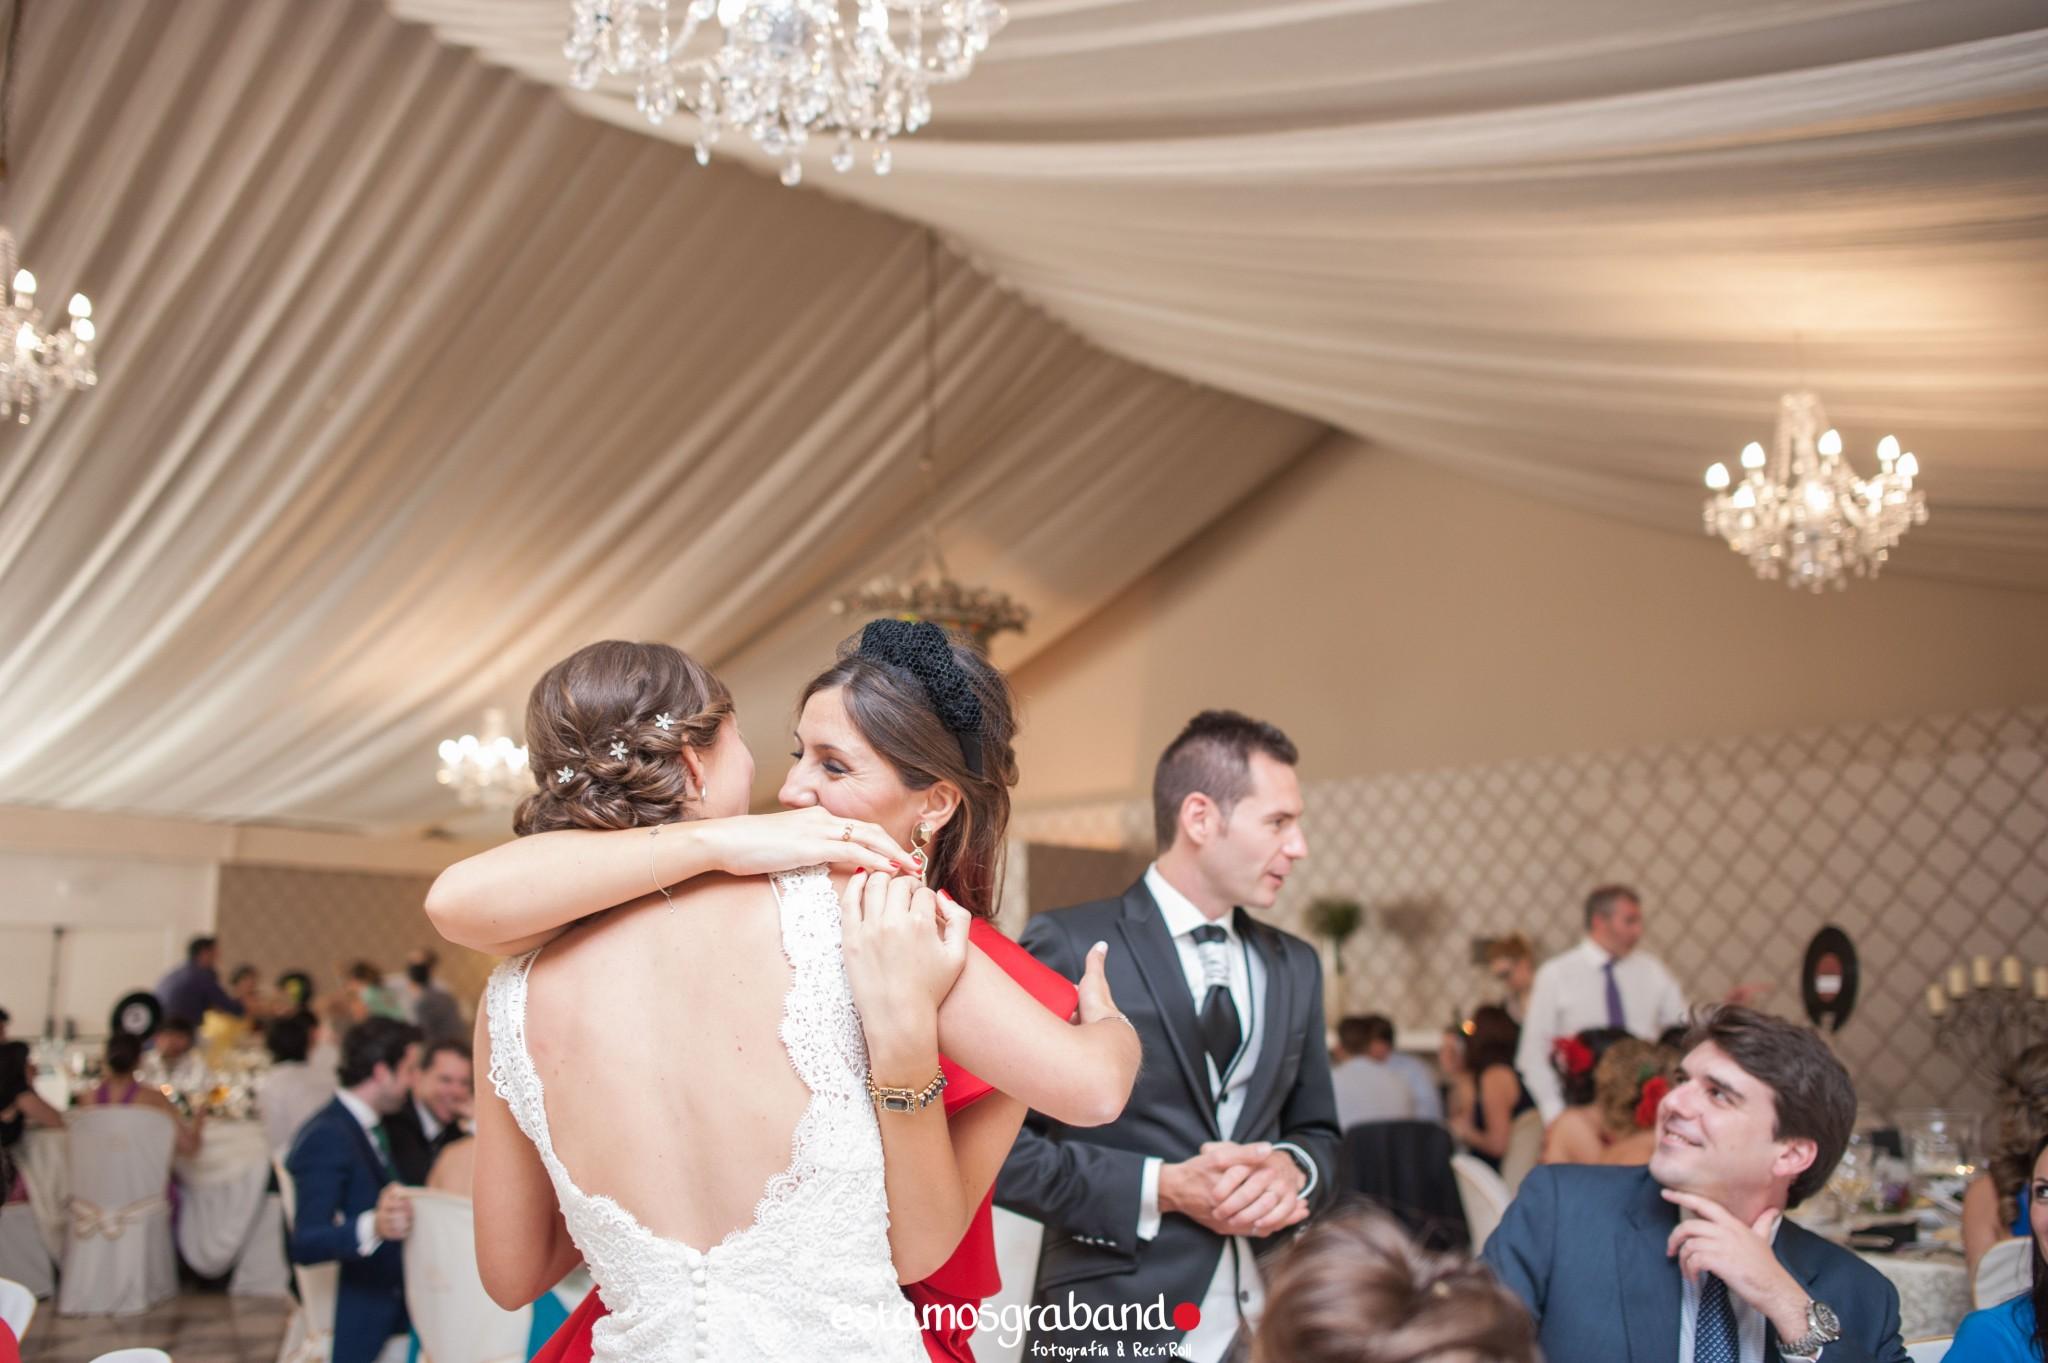 LEO-Y-PEDRO-57 Fotografía de Boda_Leo & Pedro [Jardines de la Mamunia, Granada] - video boda cadiz